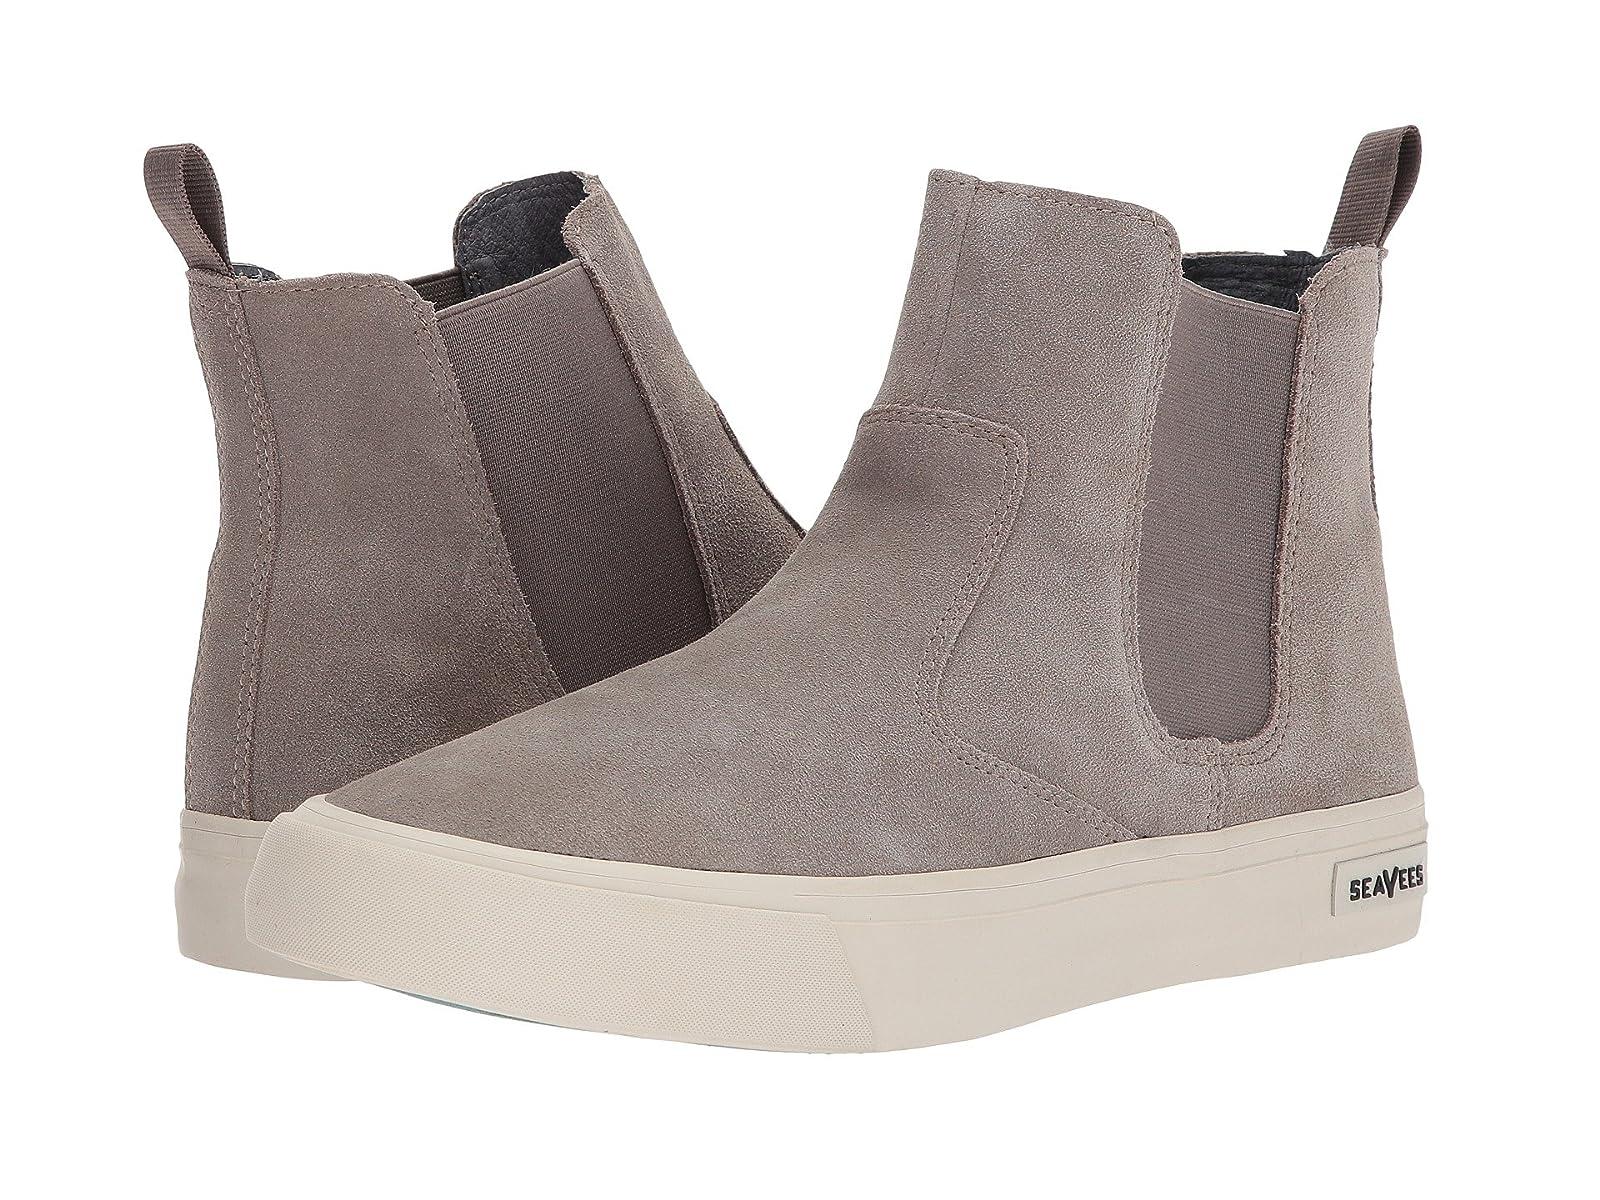 SeaVees Coronado BootCheap and distinctive eye-catching shoes